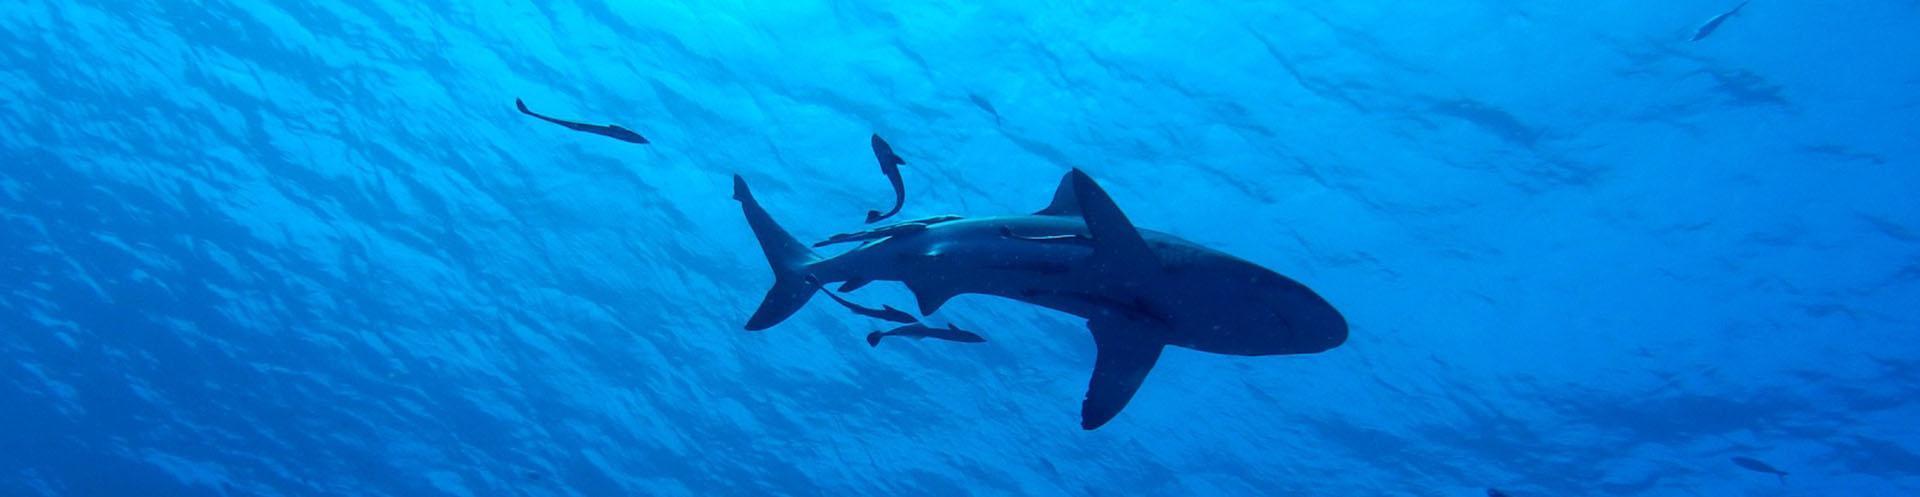 Shark Attack Risk from Wisely: A KSU News Blog